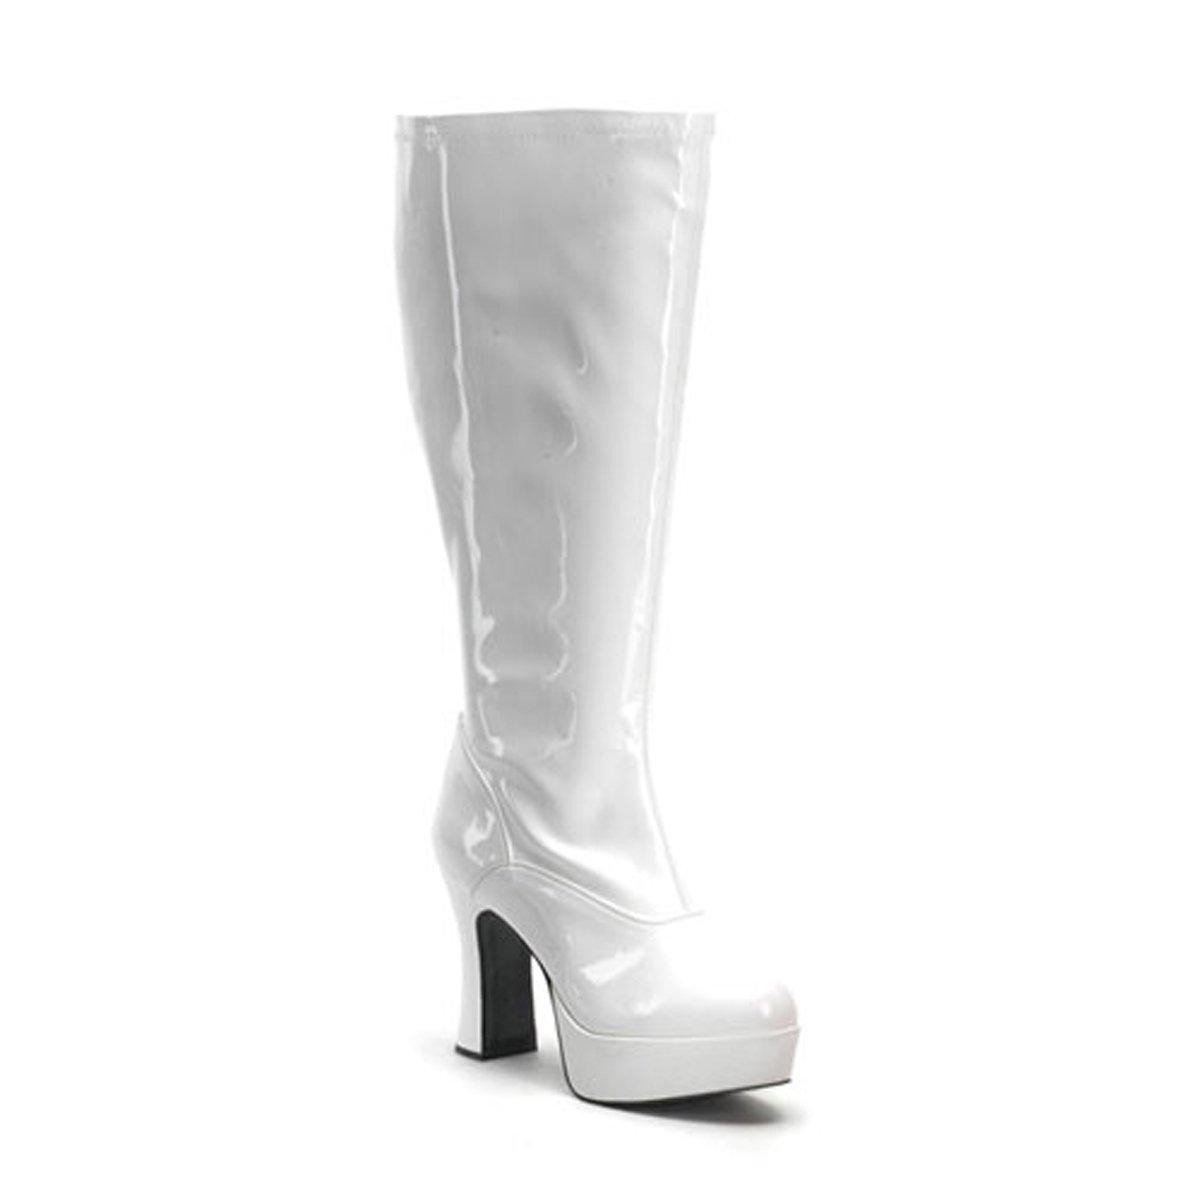 67e629a34d7 Funtasma Womens Plus Size 4 Inch Sexy Wide Width Wide Calf Knee High Boot  White Platform